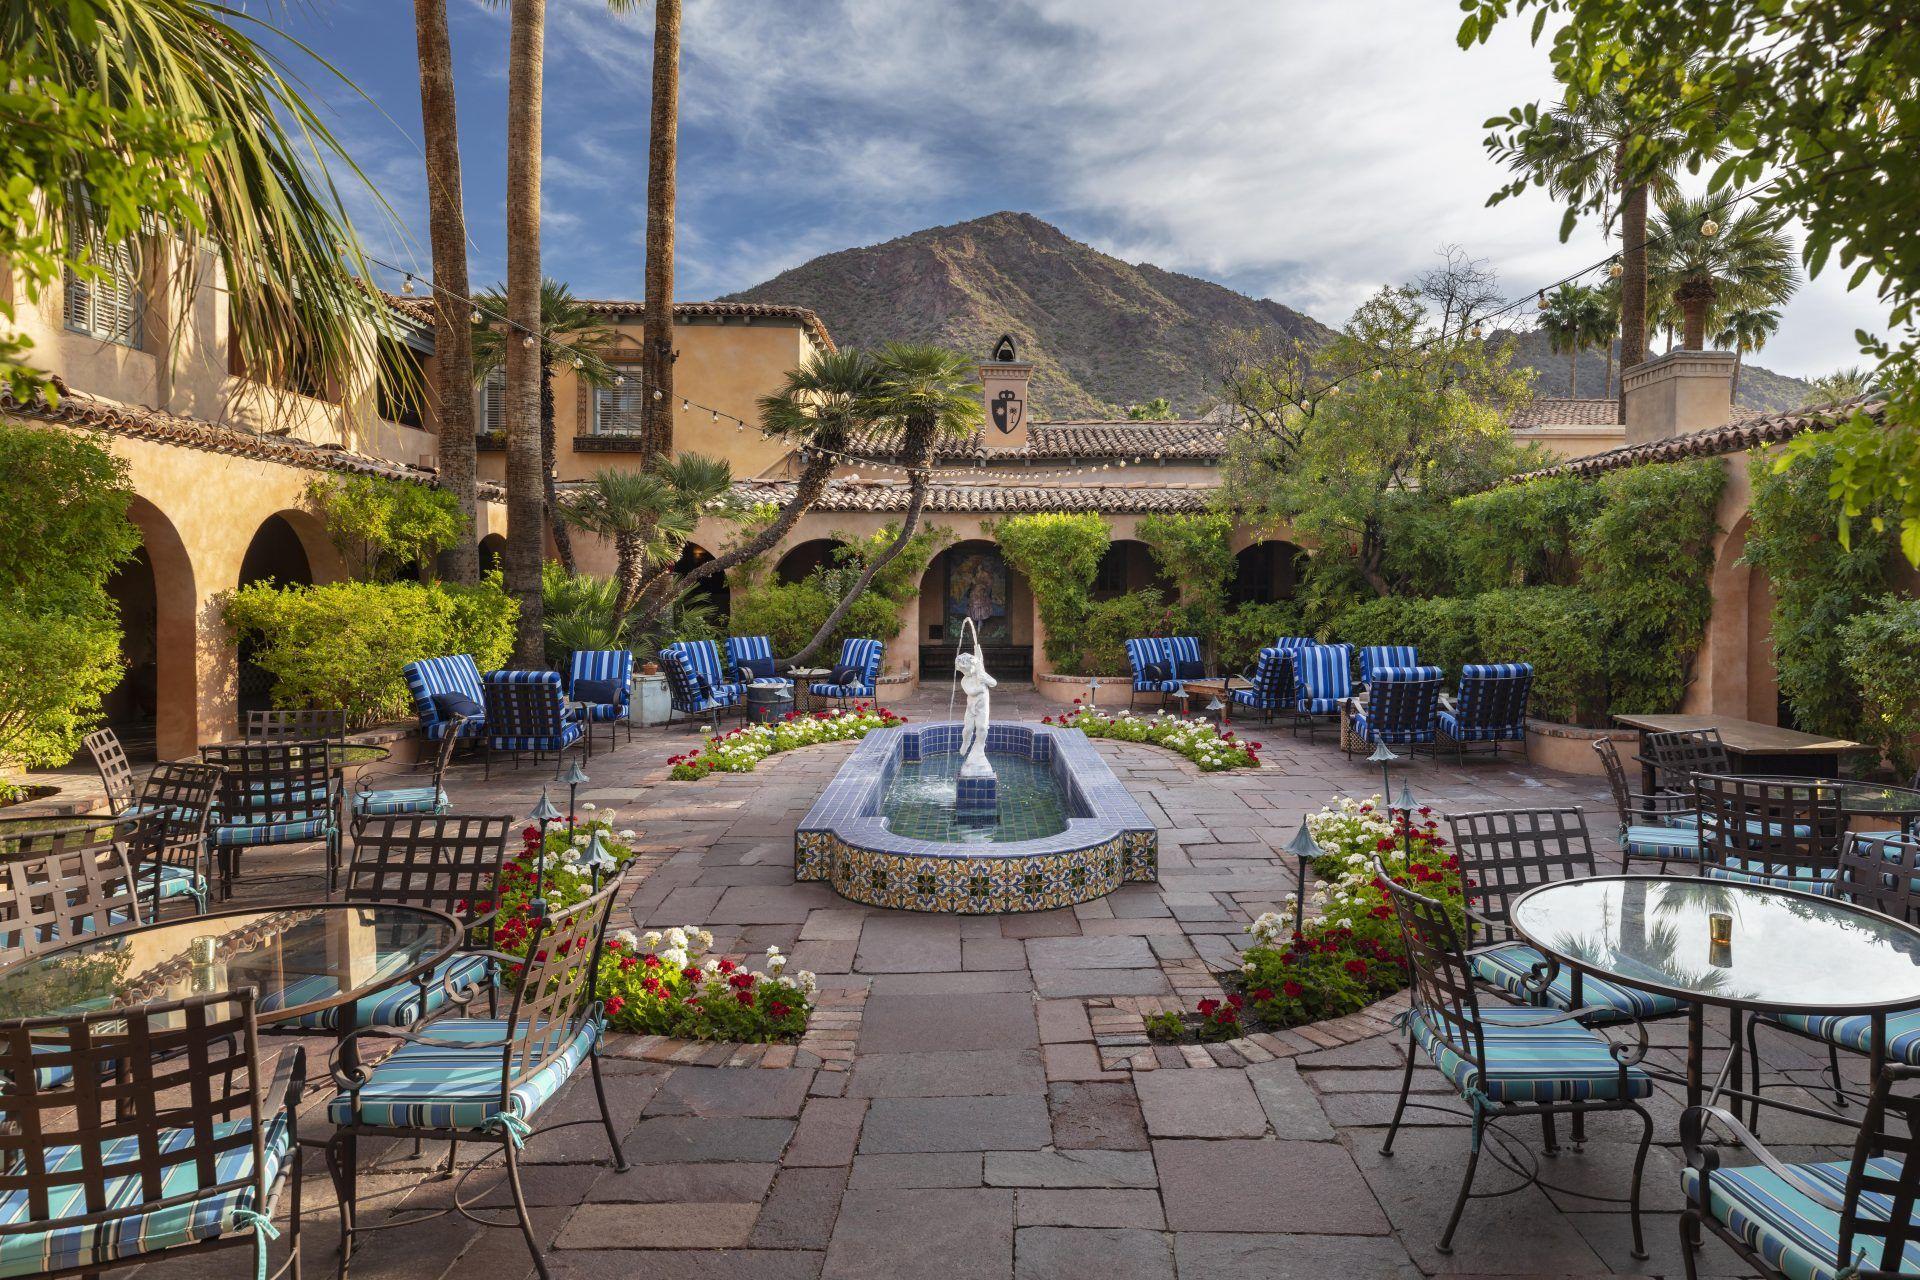 Manion Courtyard Medium Res  1920x1280 - Royal Palms Resort and Spa, Scottsdale